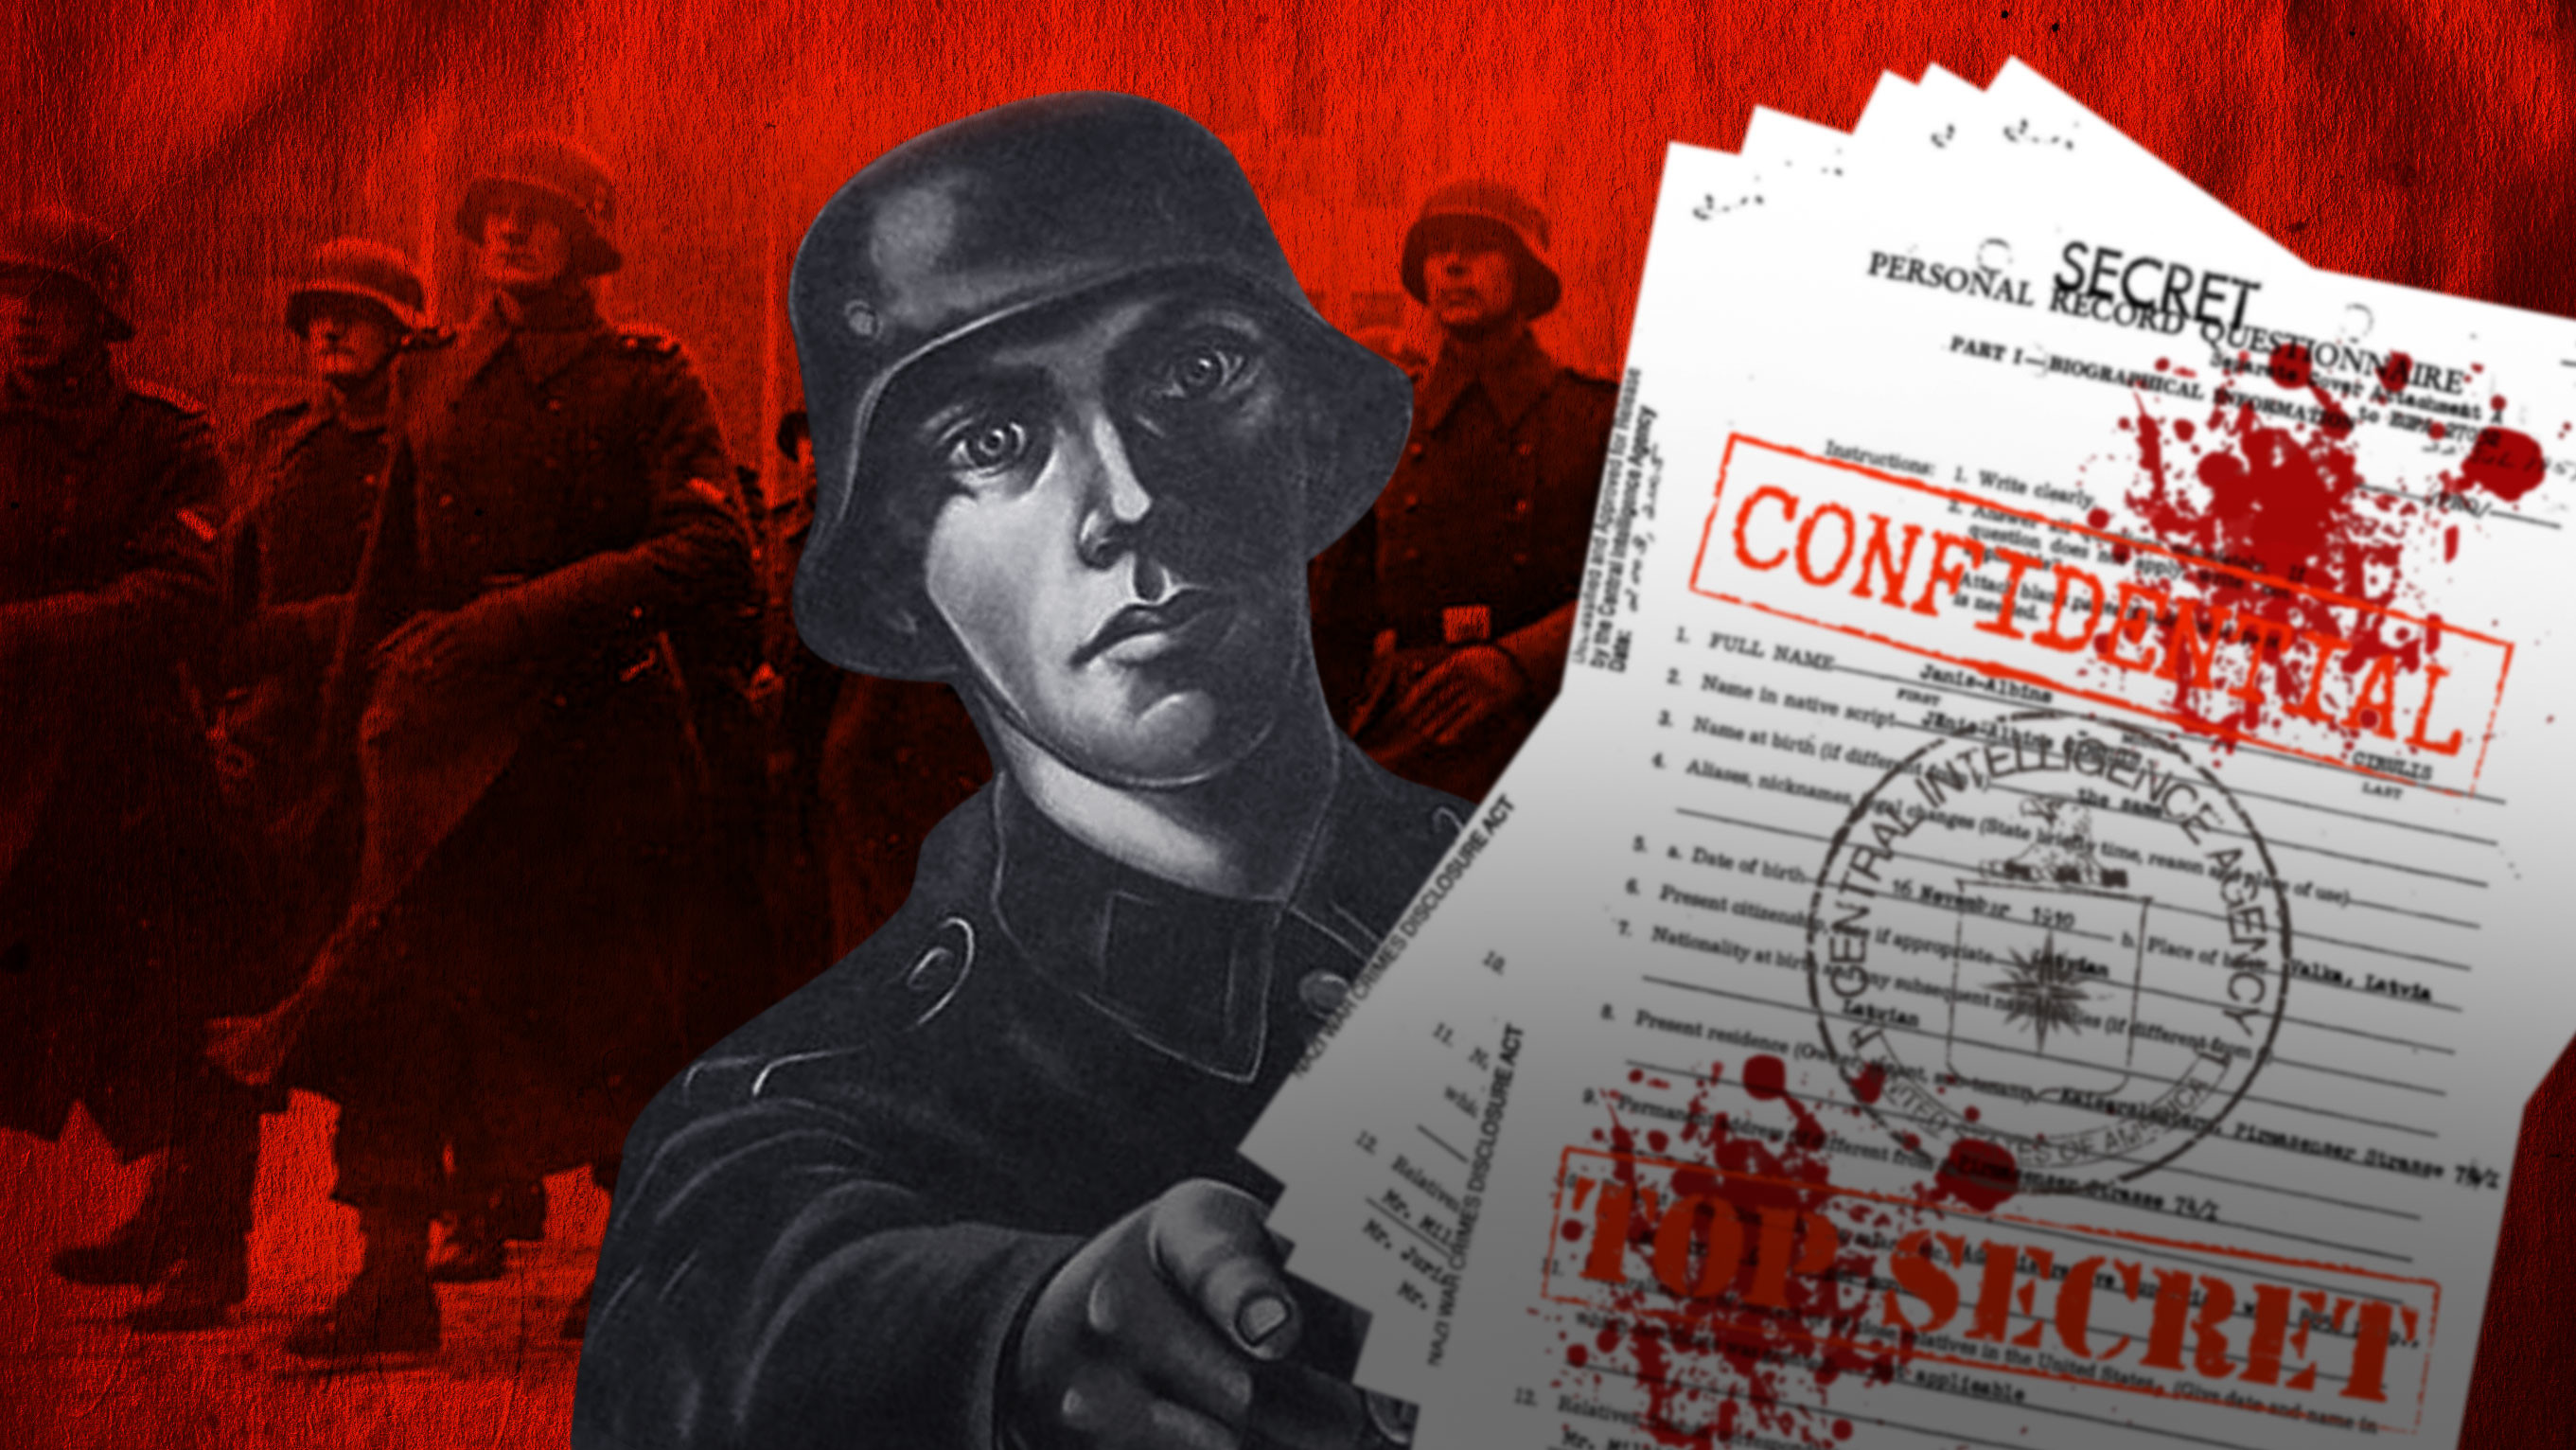 "<p>Коллаж © LIFE. Фото ©<a href=""https://www.rubaltic.ru/article/kultura-i-istoriya/23052019-legion-ss-infitsiroval-natsizmom-mnogie-pokoleniya-latyshey/"" target=""_self"">rubaltic.ru</a>  © <a href=""https://archive.org/details/CirulisJanisAlbins"" target=""_self"">archive.org</a></p>"